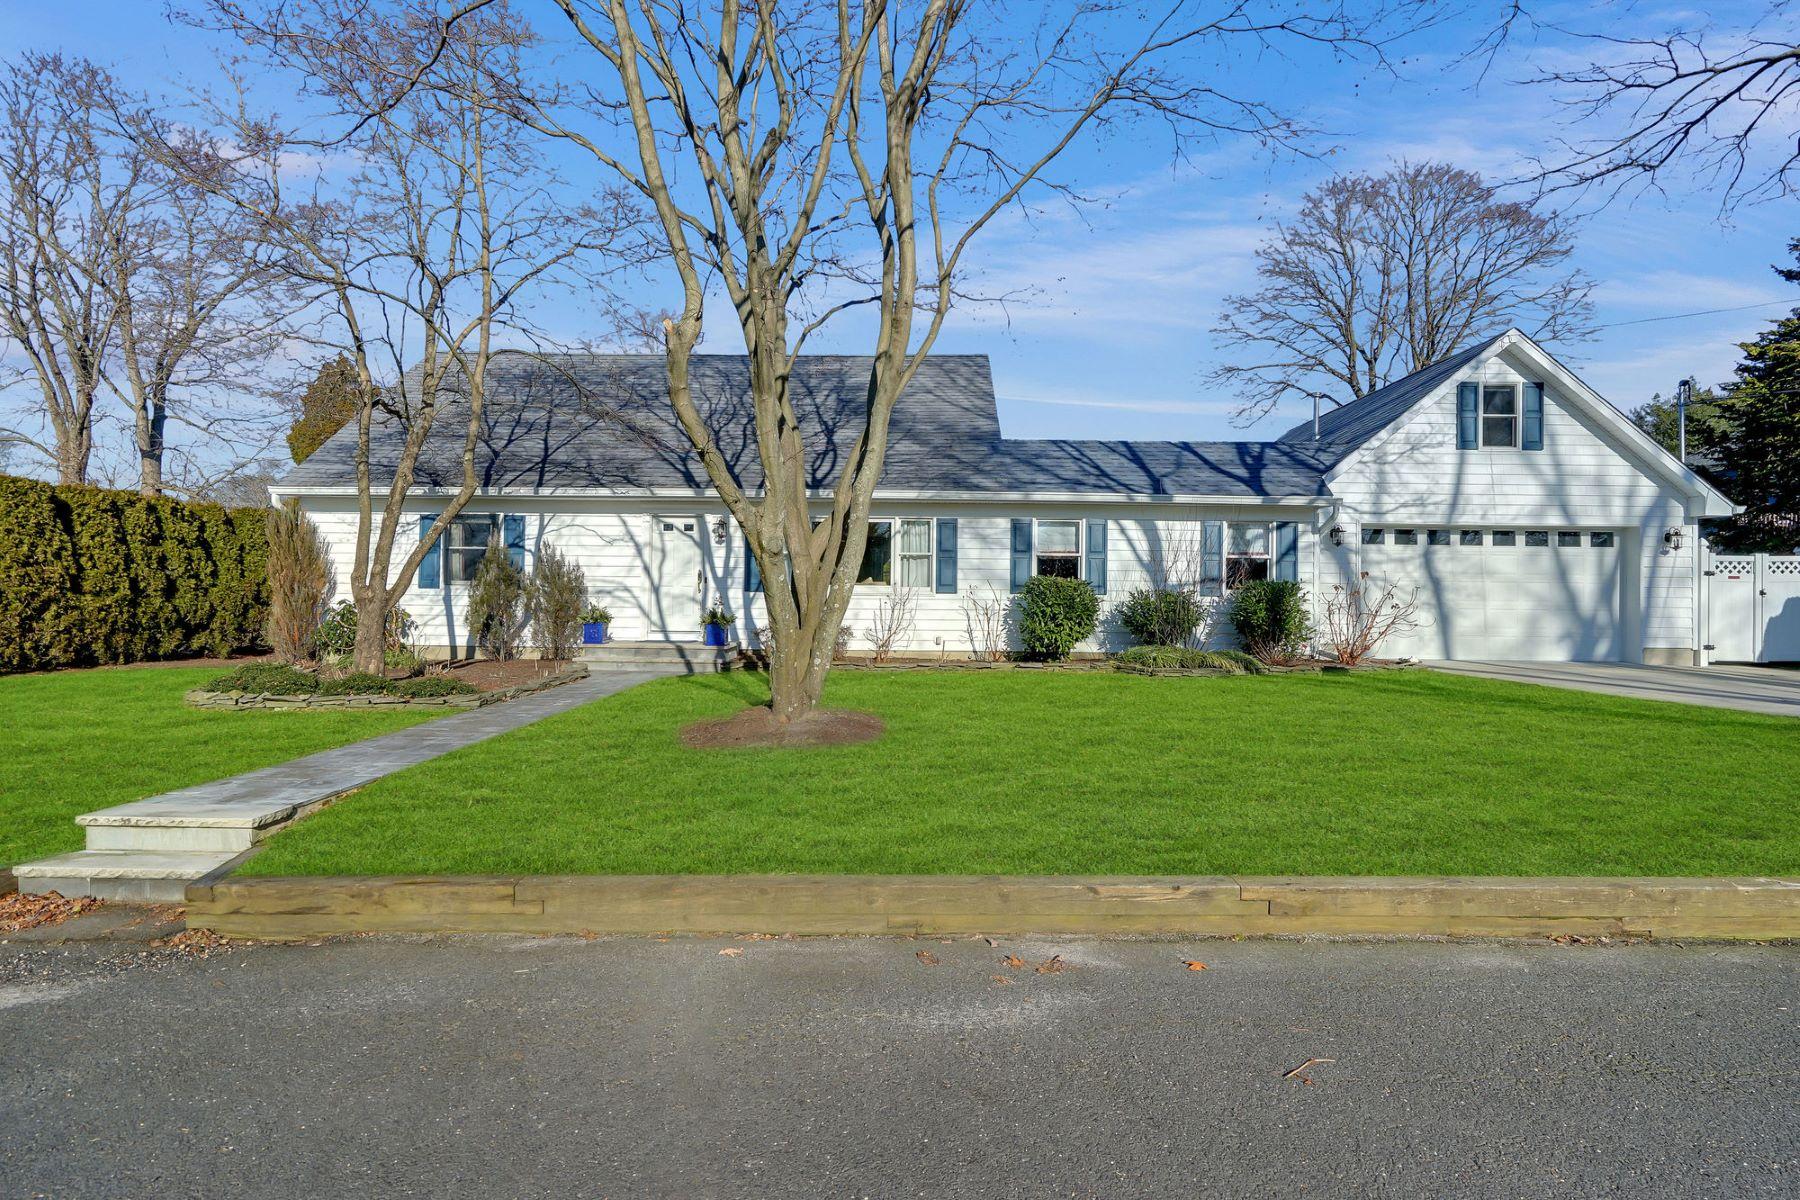 Single Family Homes для того Продажа на Charm and Character 2406 Cypress Street, Wall, Нью-Джерси 08736 Соединенные Штаты